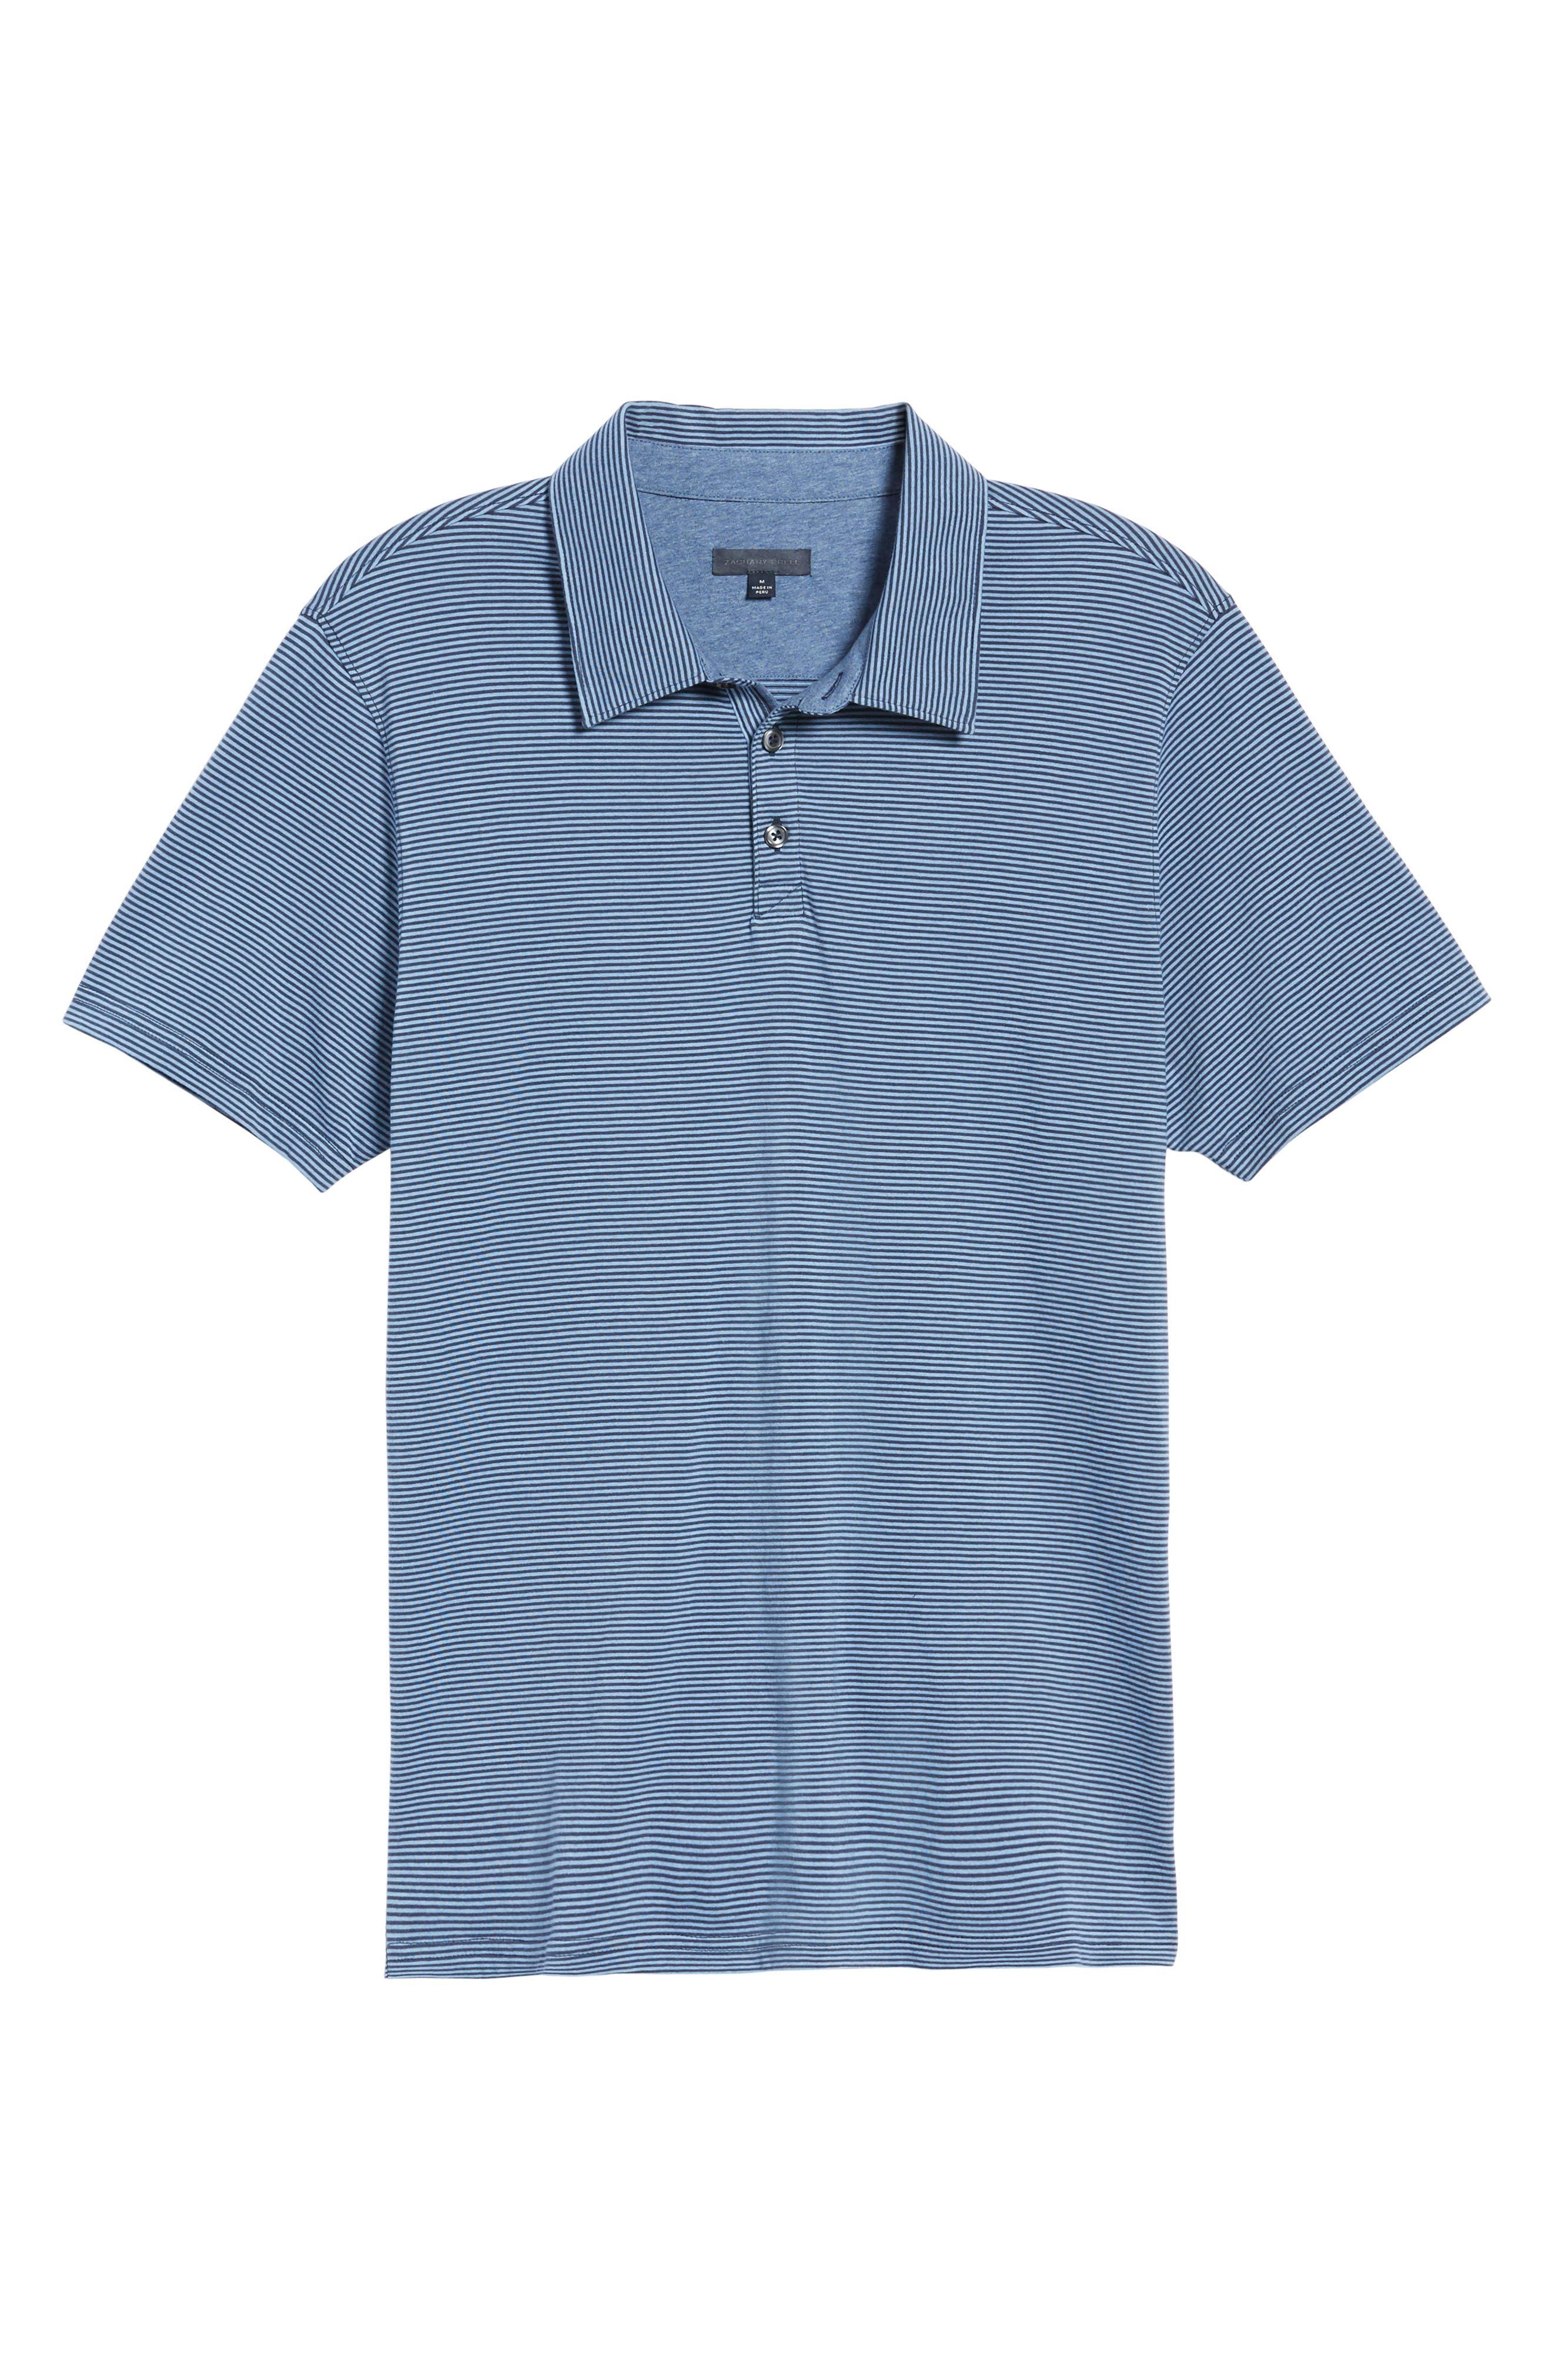 Gilmore Stripe Jersey Polo,                             Alternate thumbnail 6, color,                             BLUE